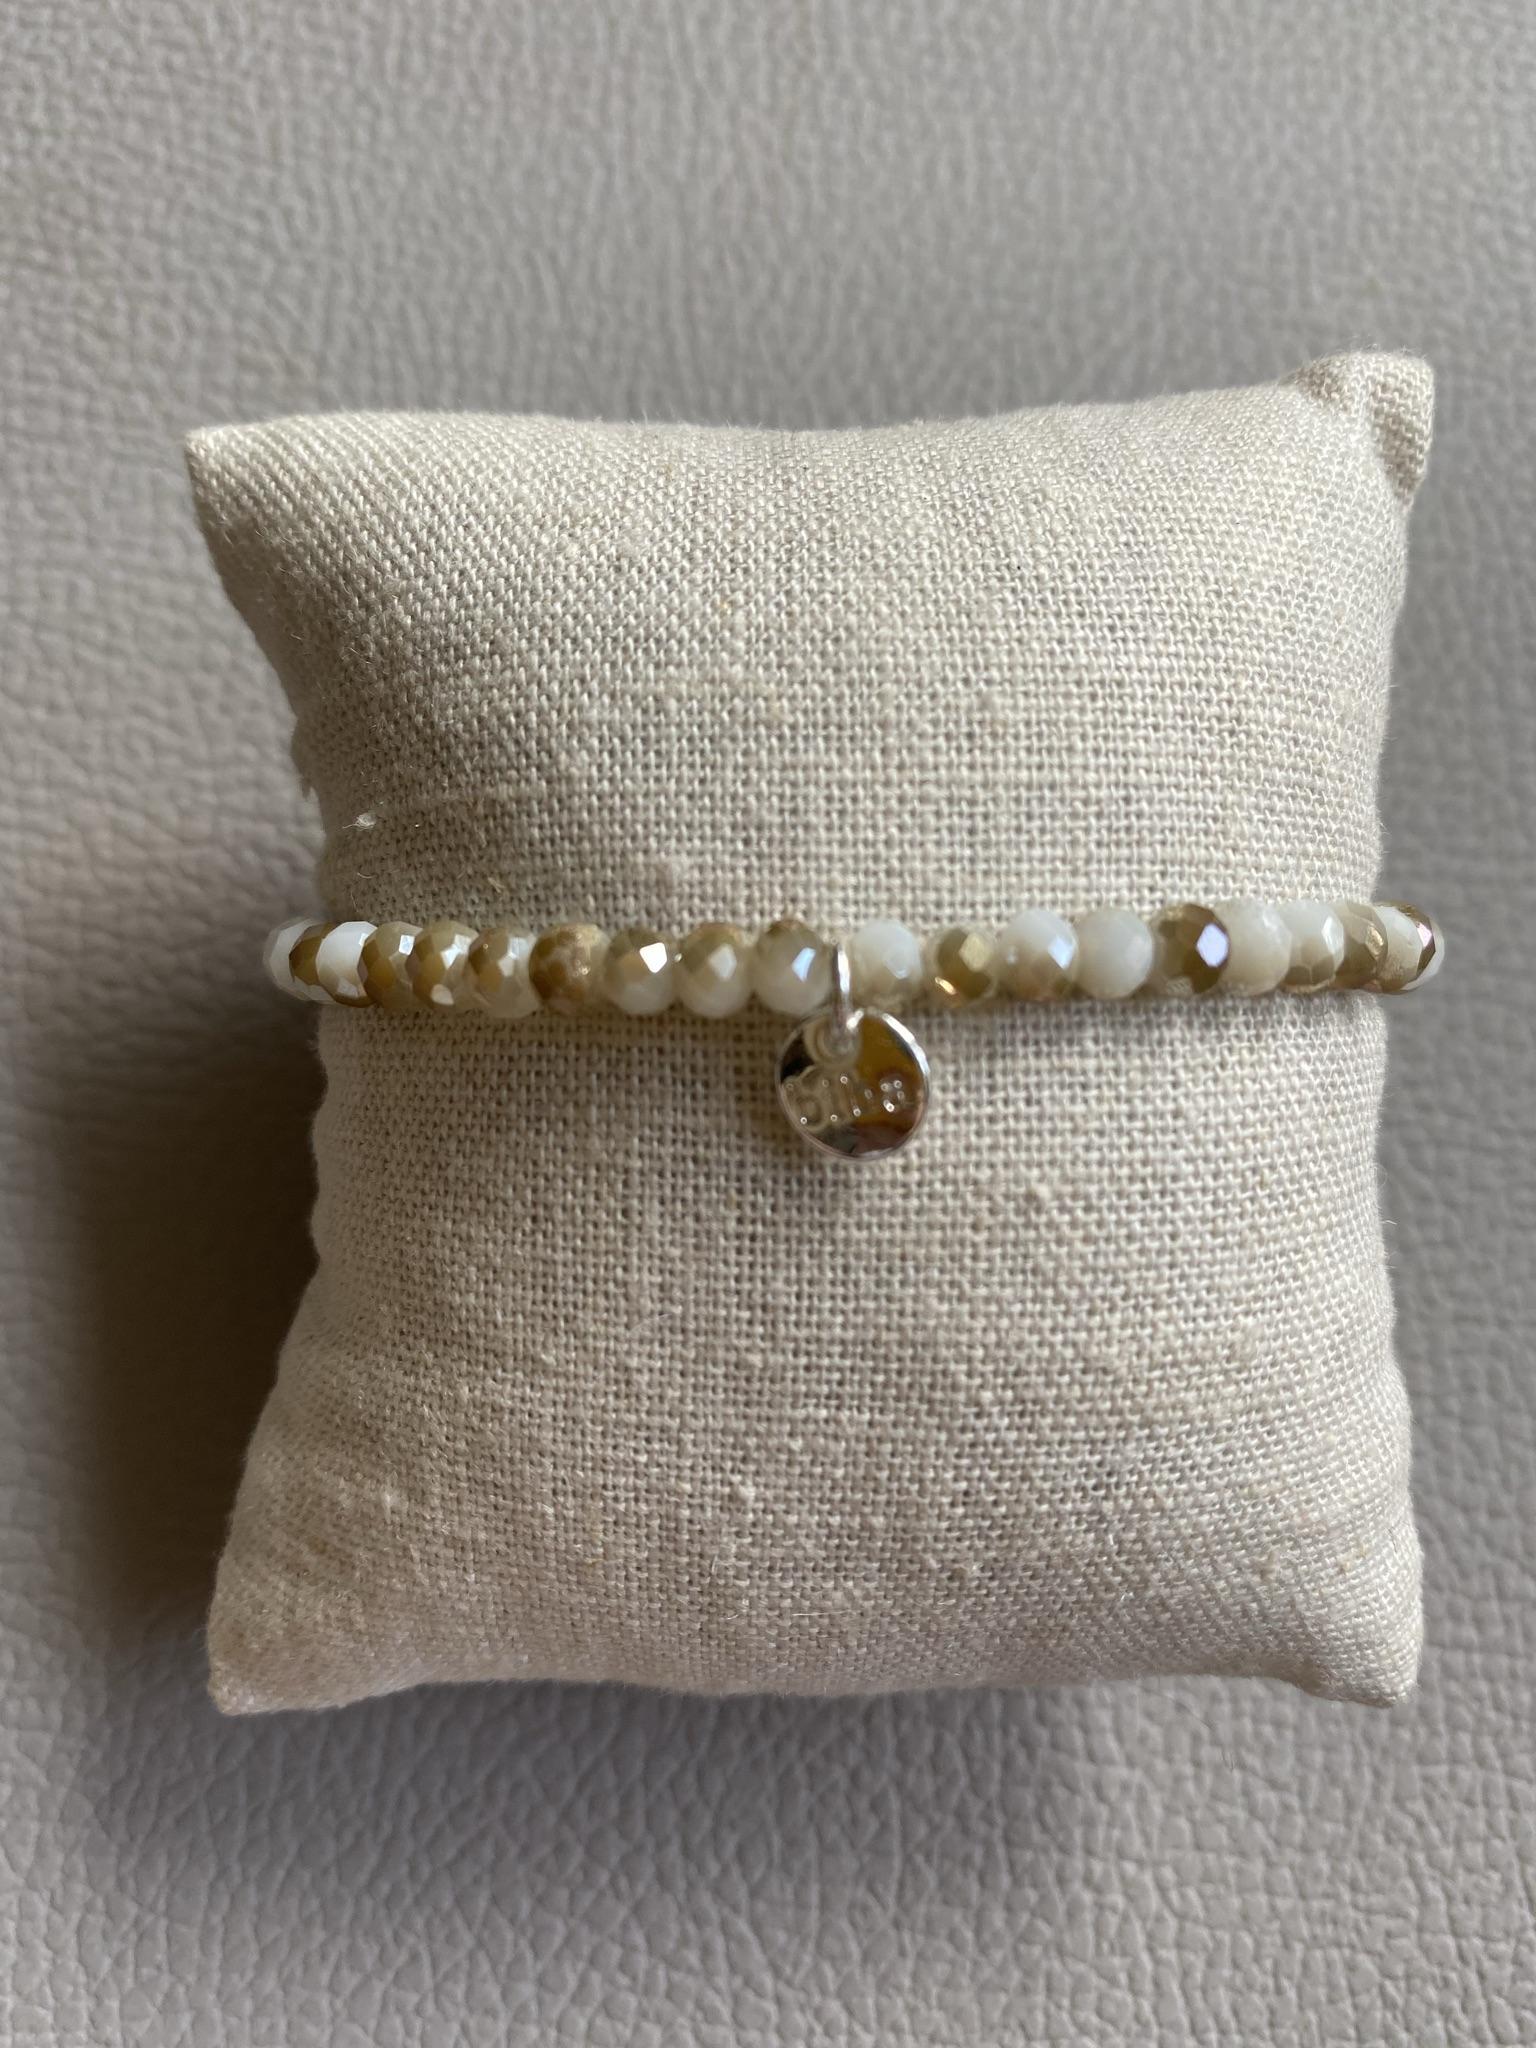 Biba Armband altweiß, grün, beige, silber